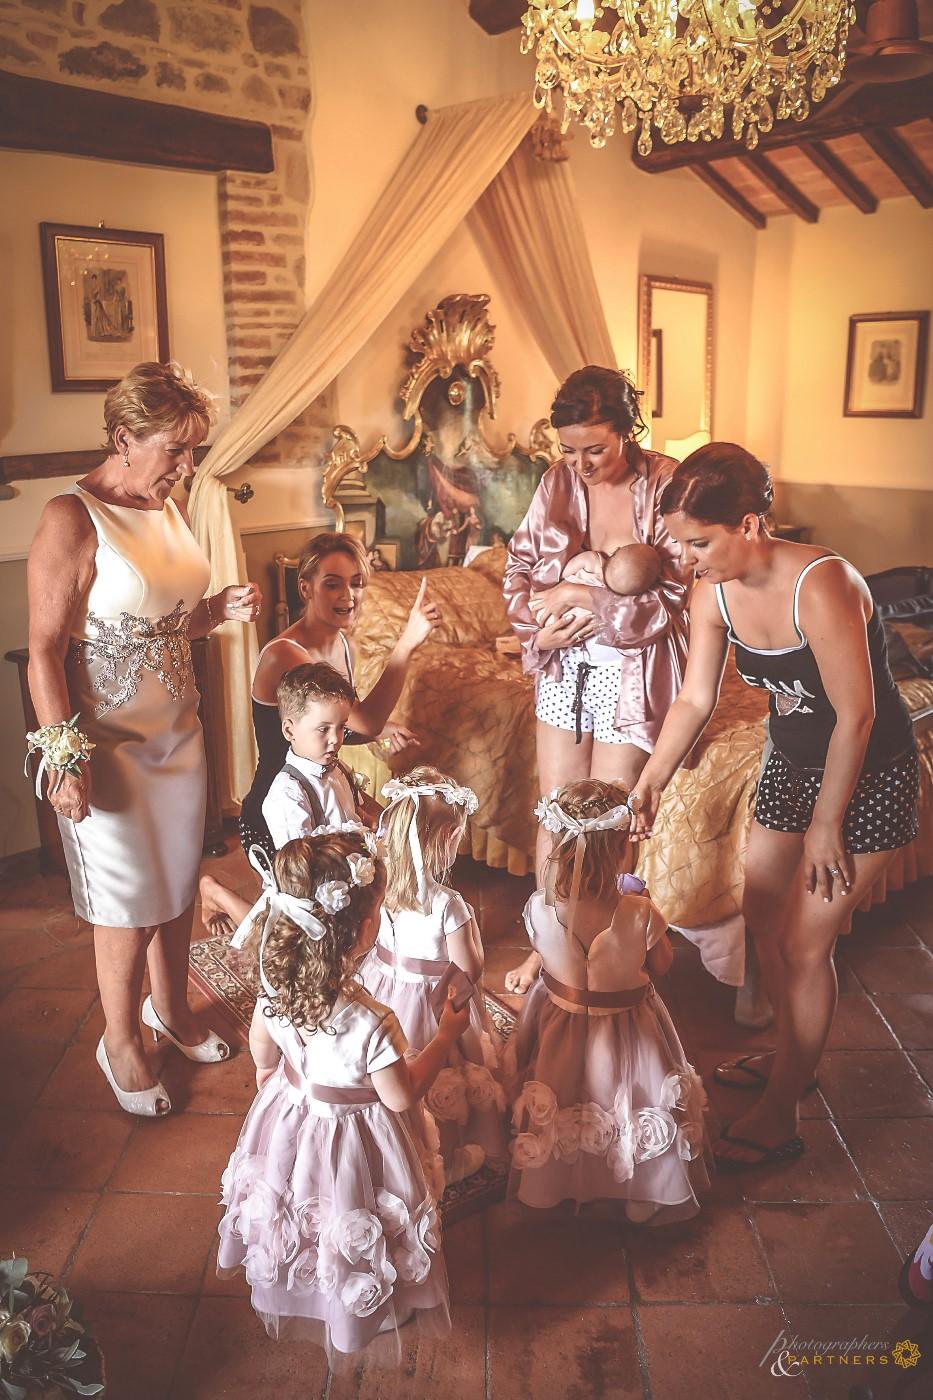 New generation bridesmaids at work 🌸